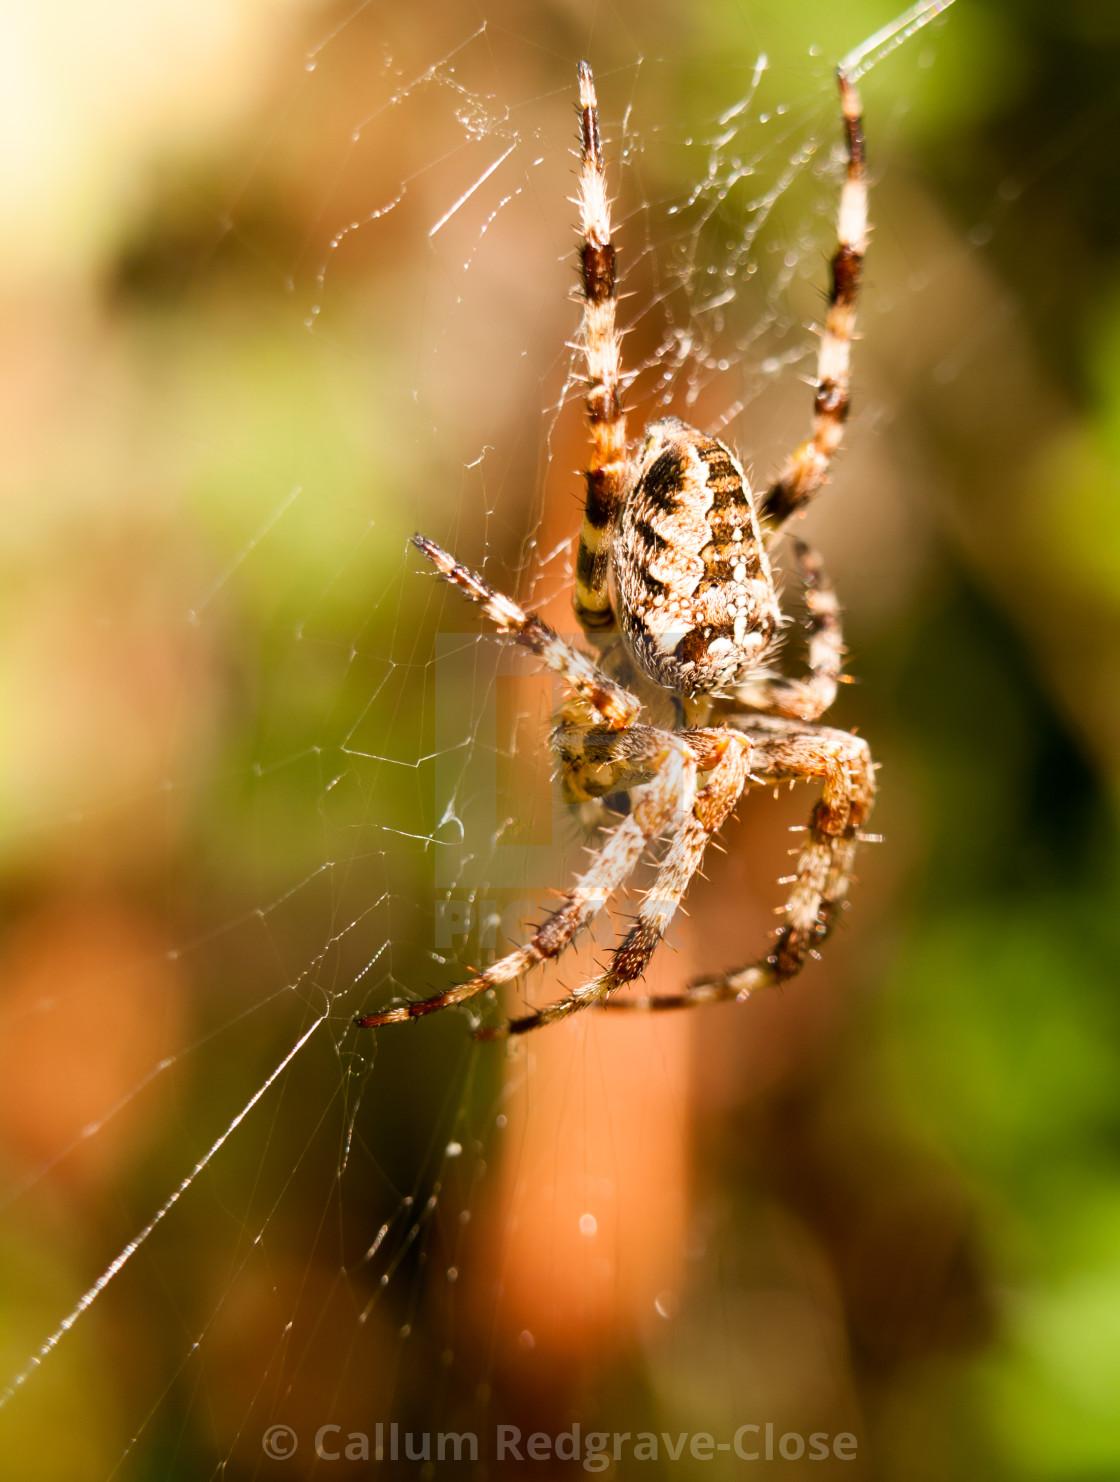 close up garden spider hanging on web Araneus diadematus - License ...